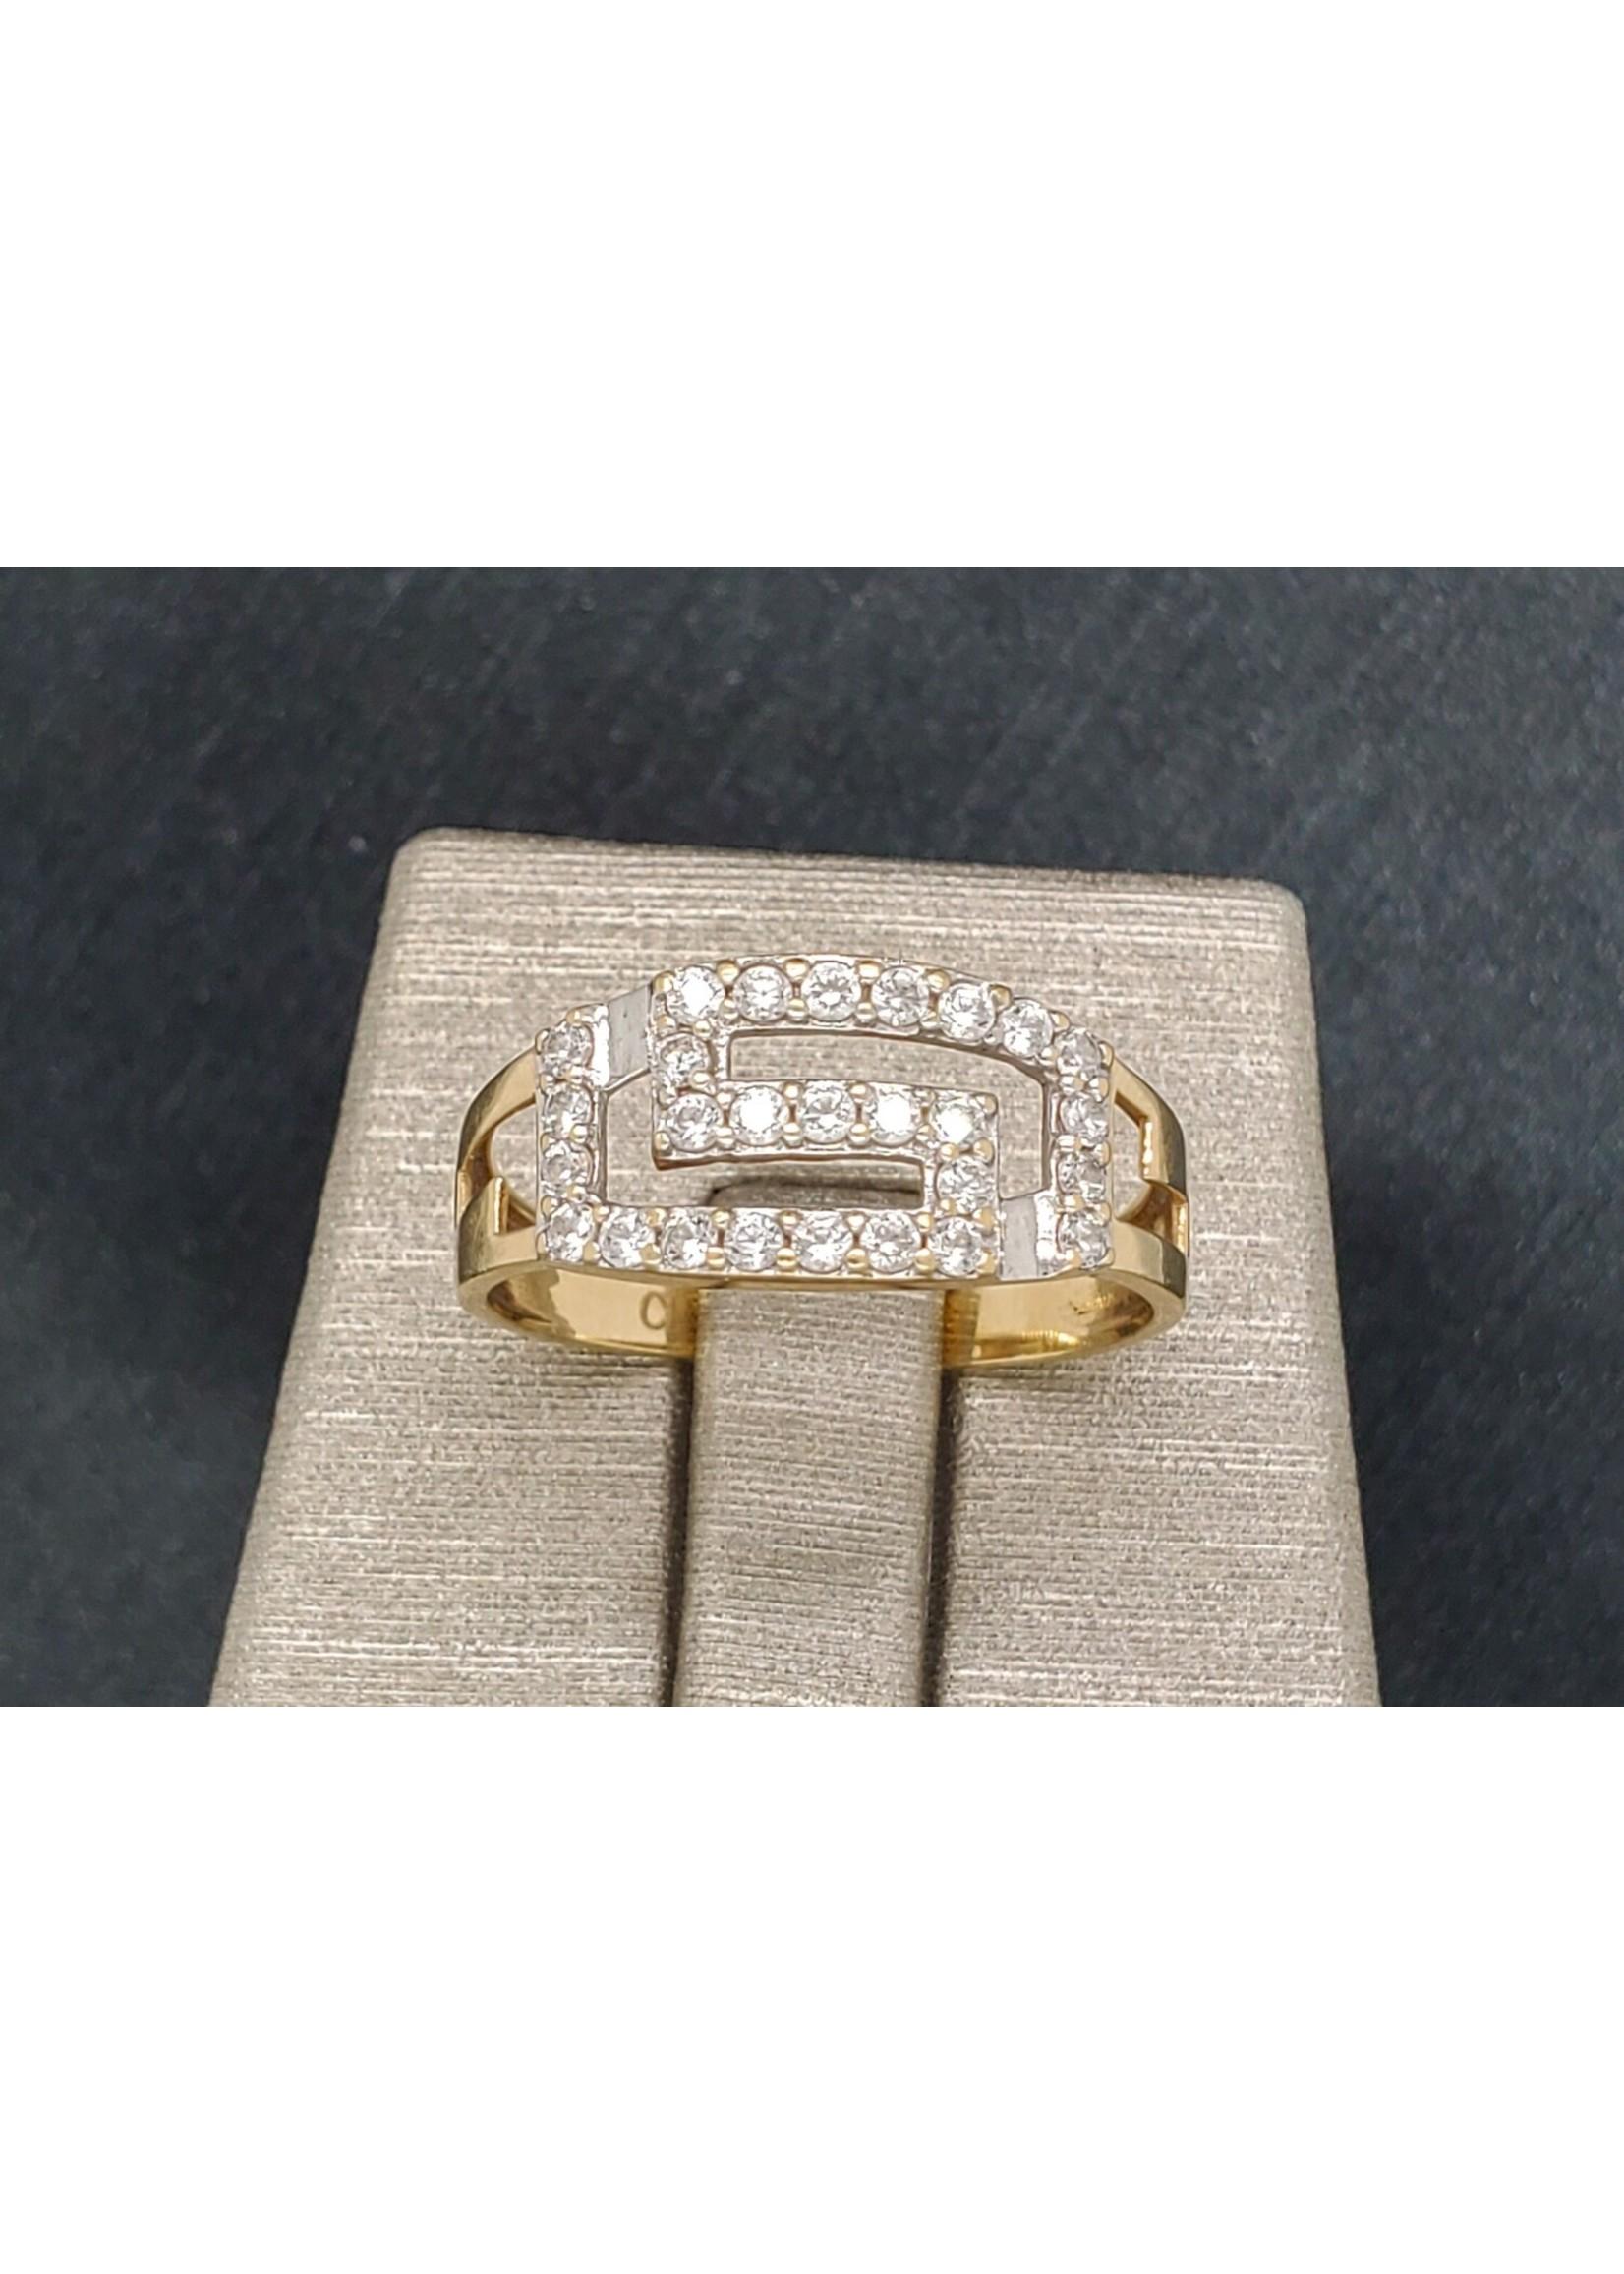 Vintage Jewellery Vintage 10k Greek Diamond Ring | Size 7.5 YG